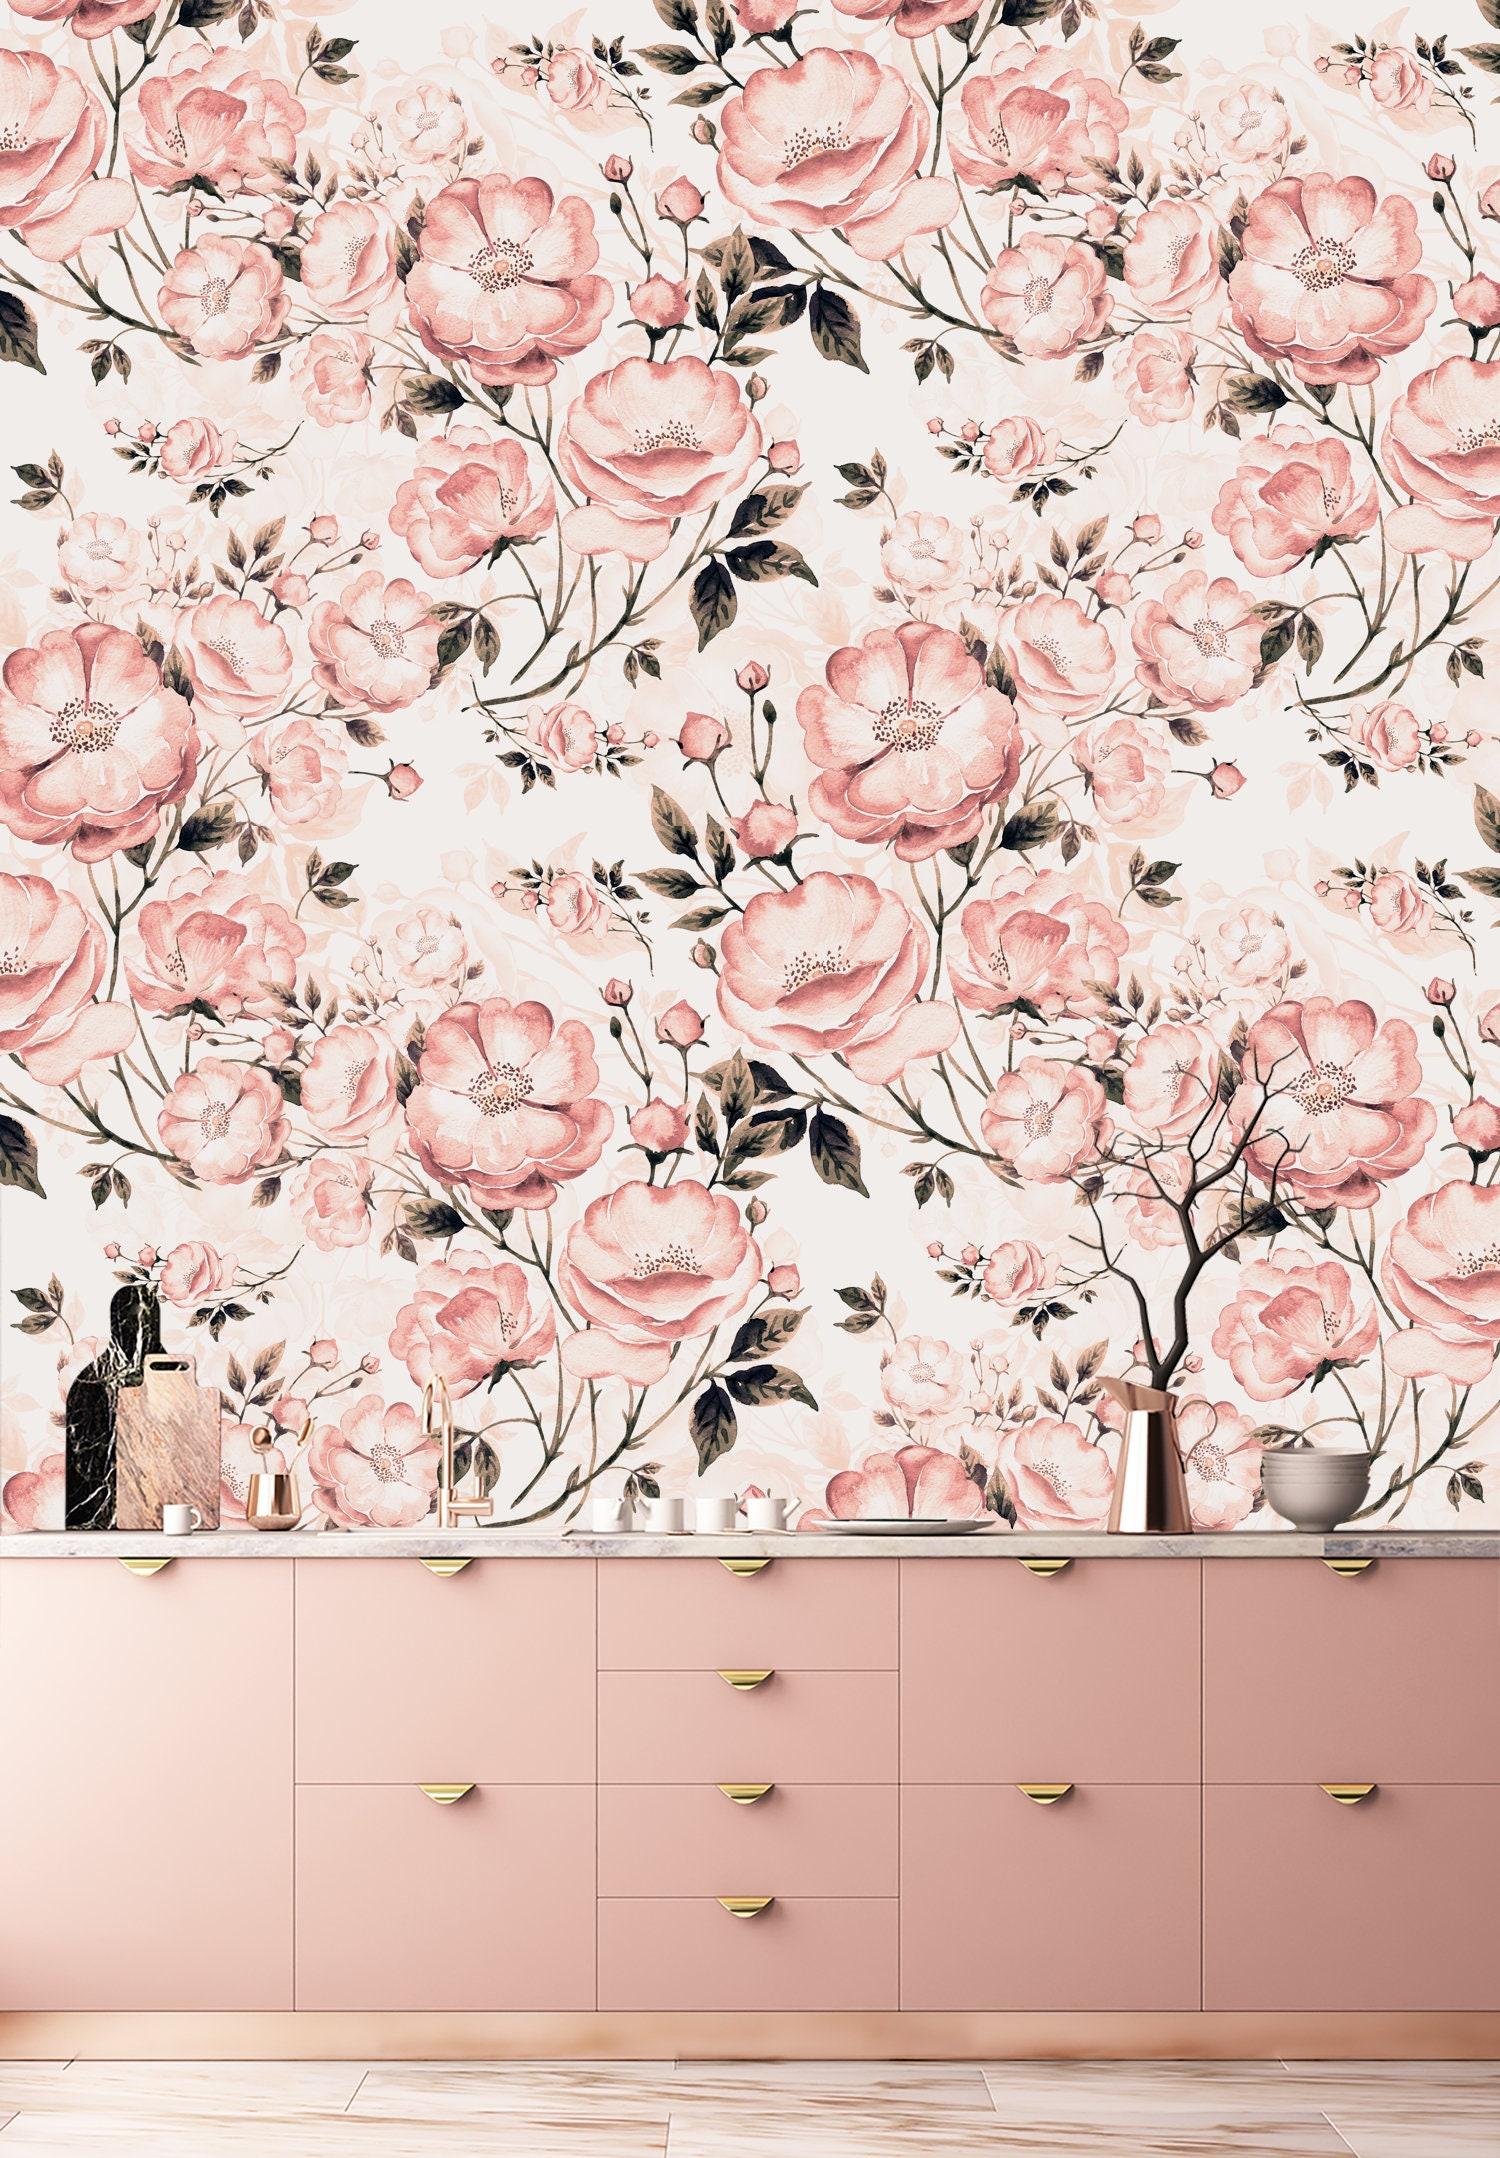 Nursery Floral Oil Painting Print Wallpaper Floral Wallpaper Etsy